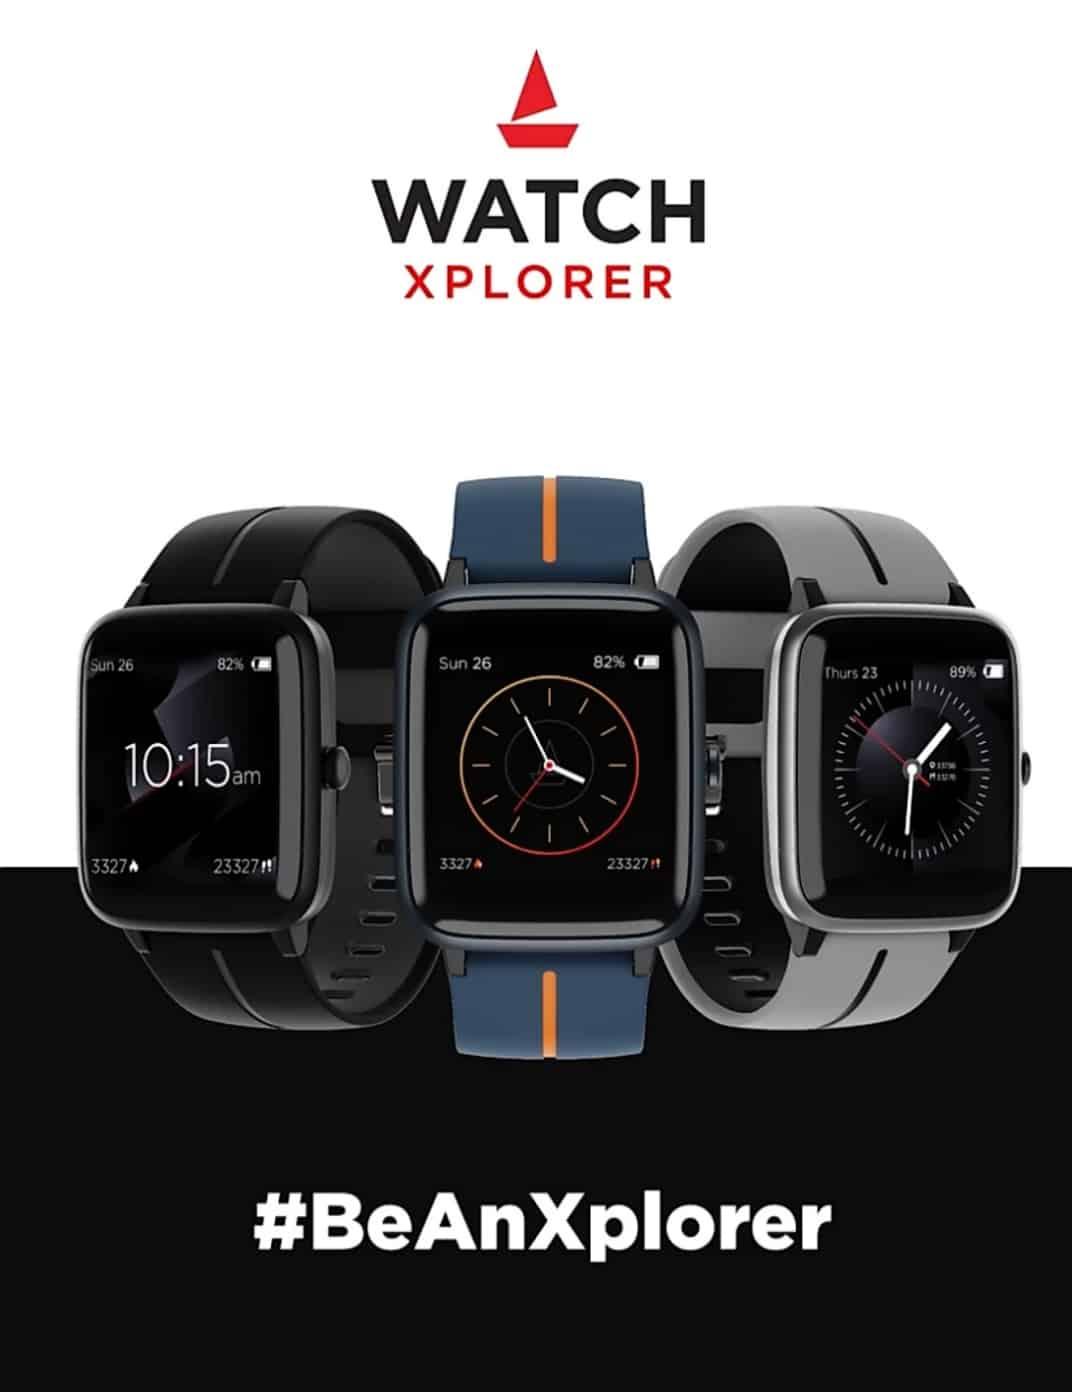 boAt Watch QXplorer Launch Announcement- 4_TechnoSports.co.in